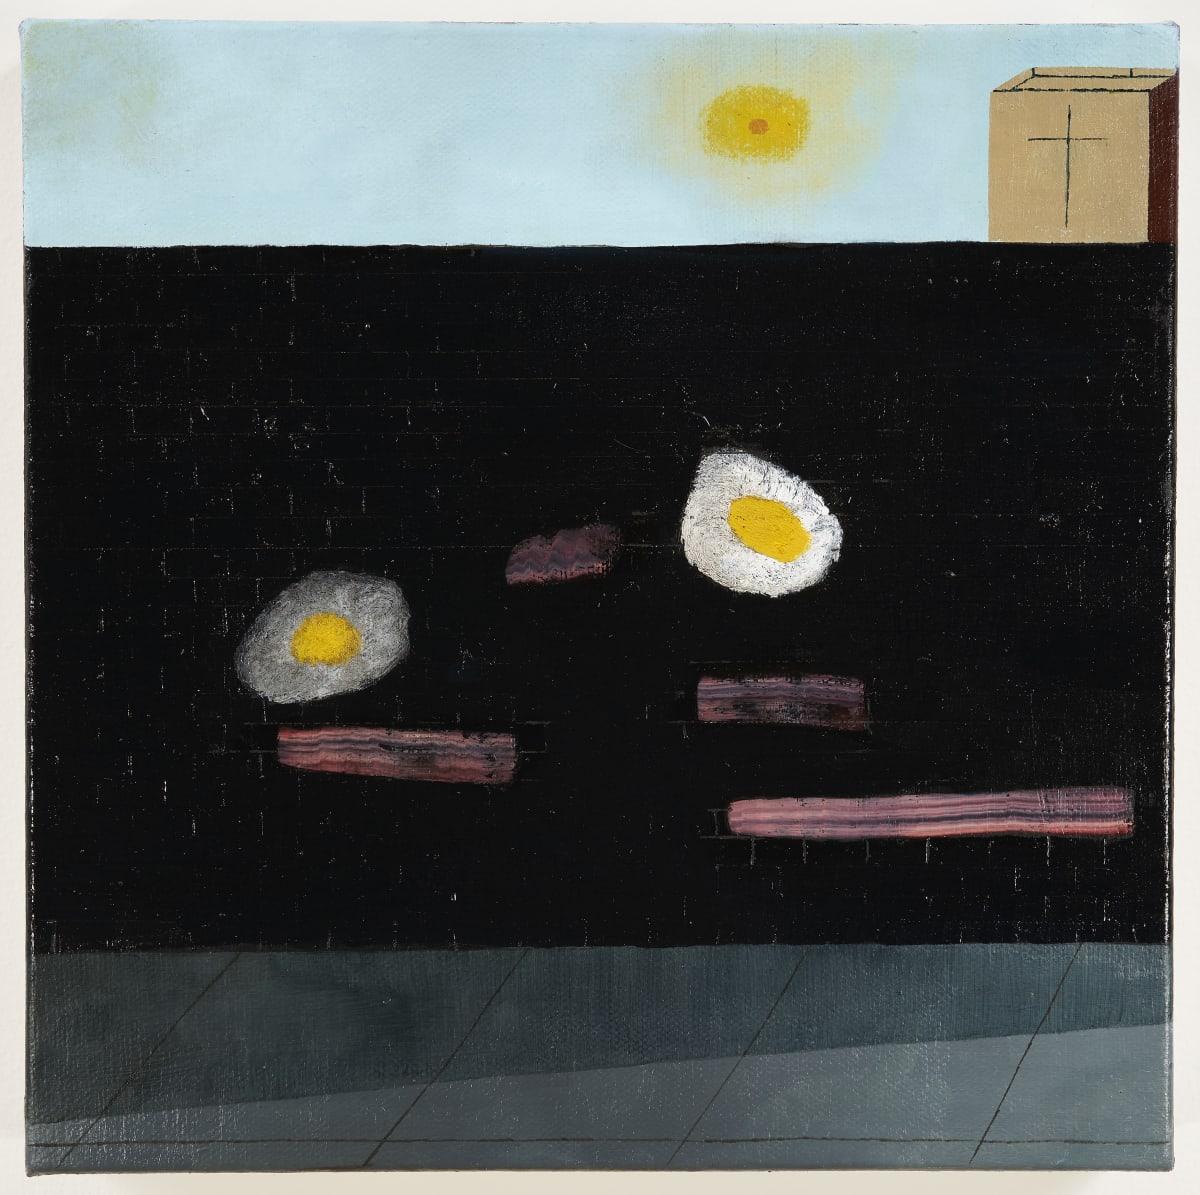 Kenny Rivero, Bacon, Eggs and Jesus, 2018